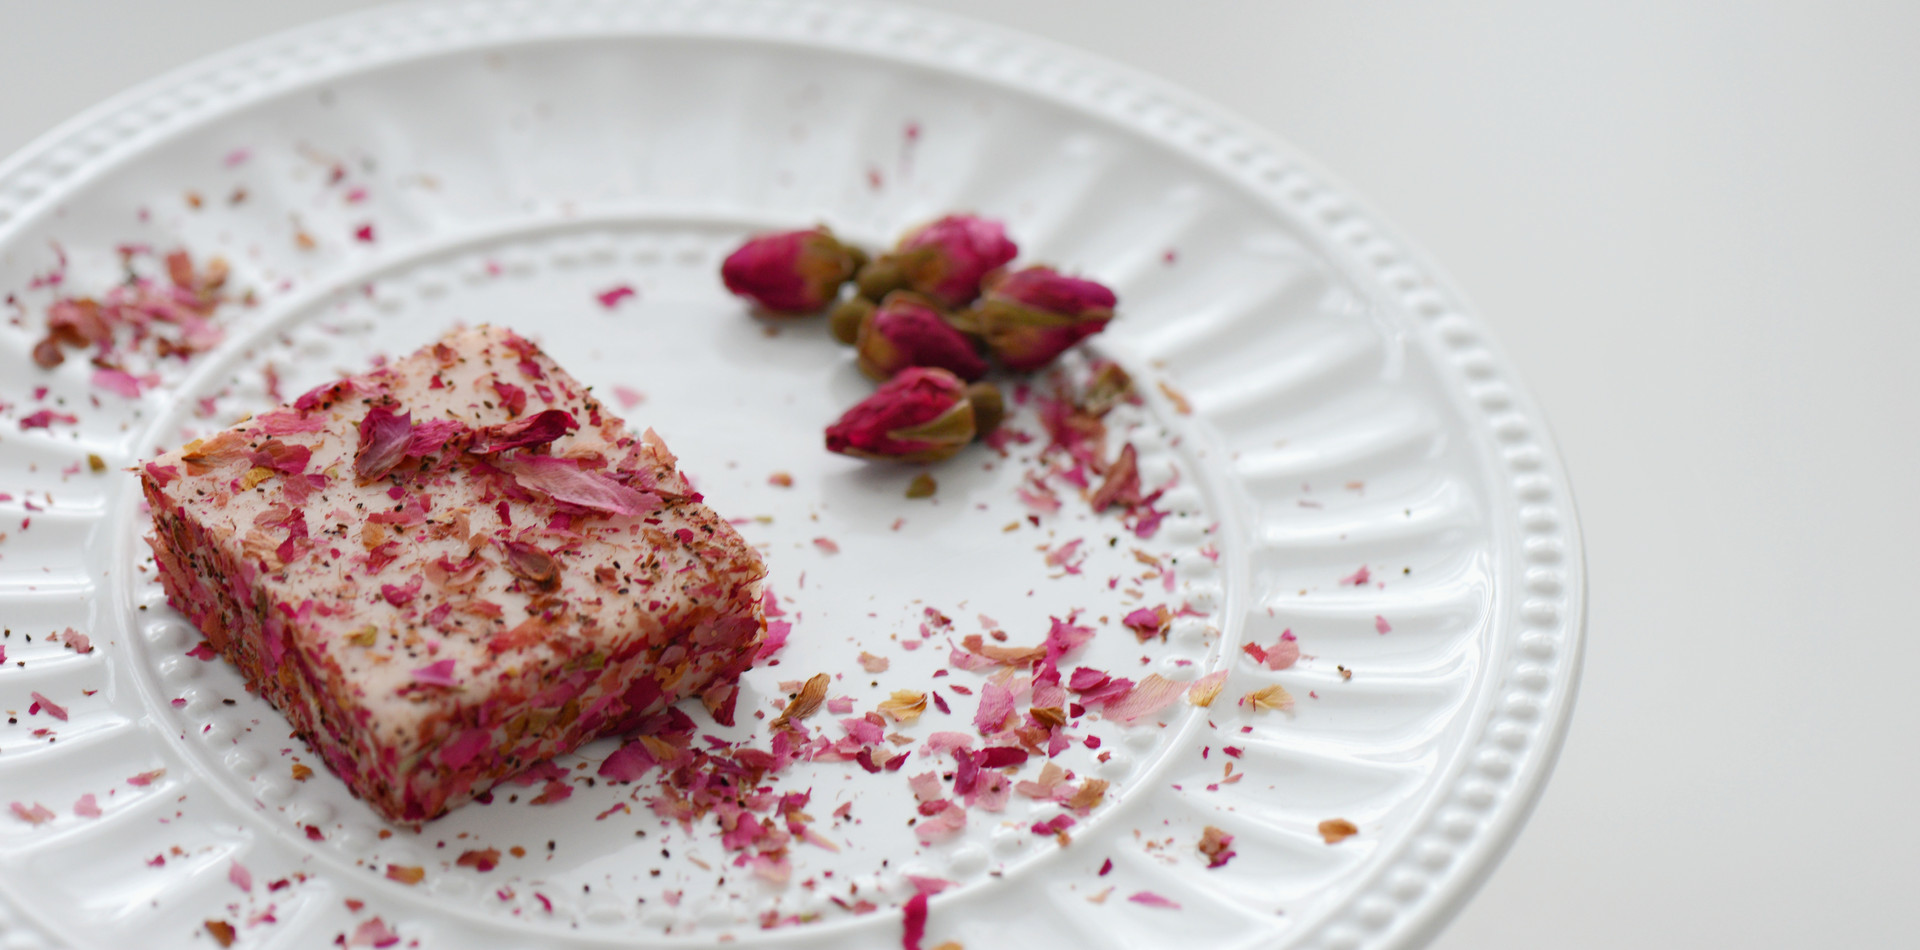 Nama Chocolate - Rose and Strawberry